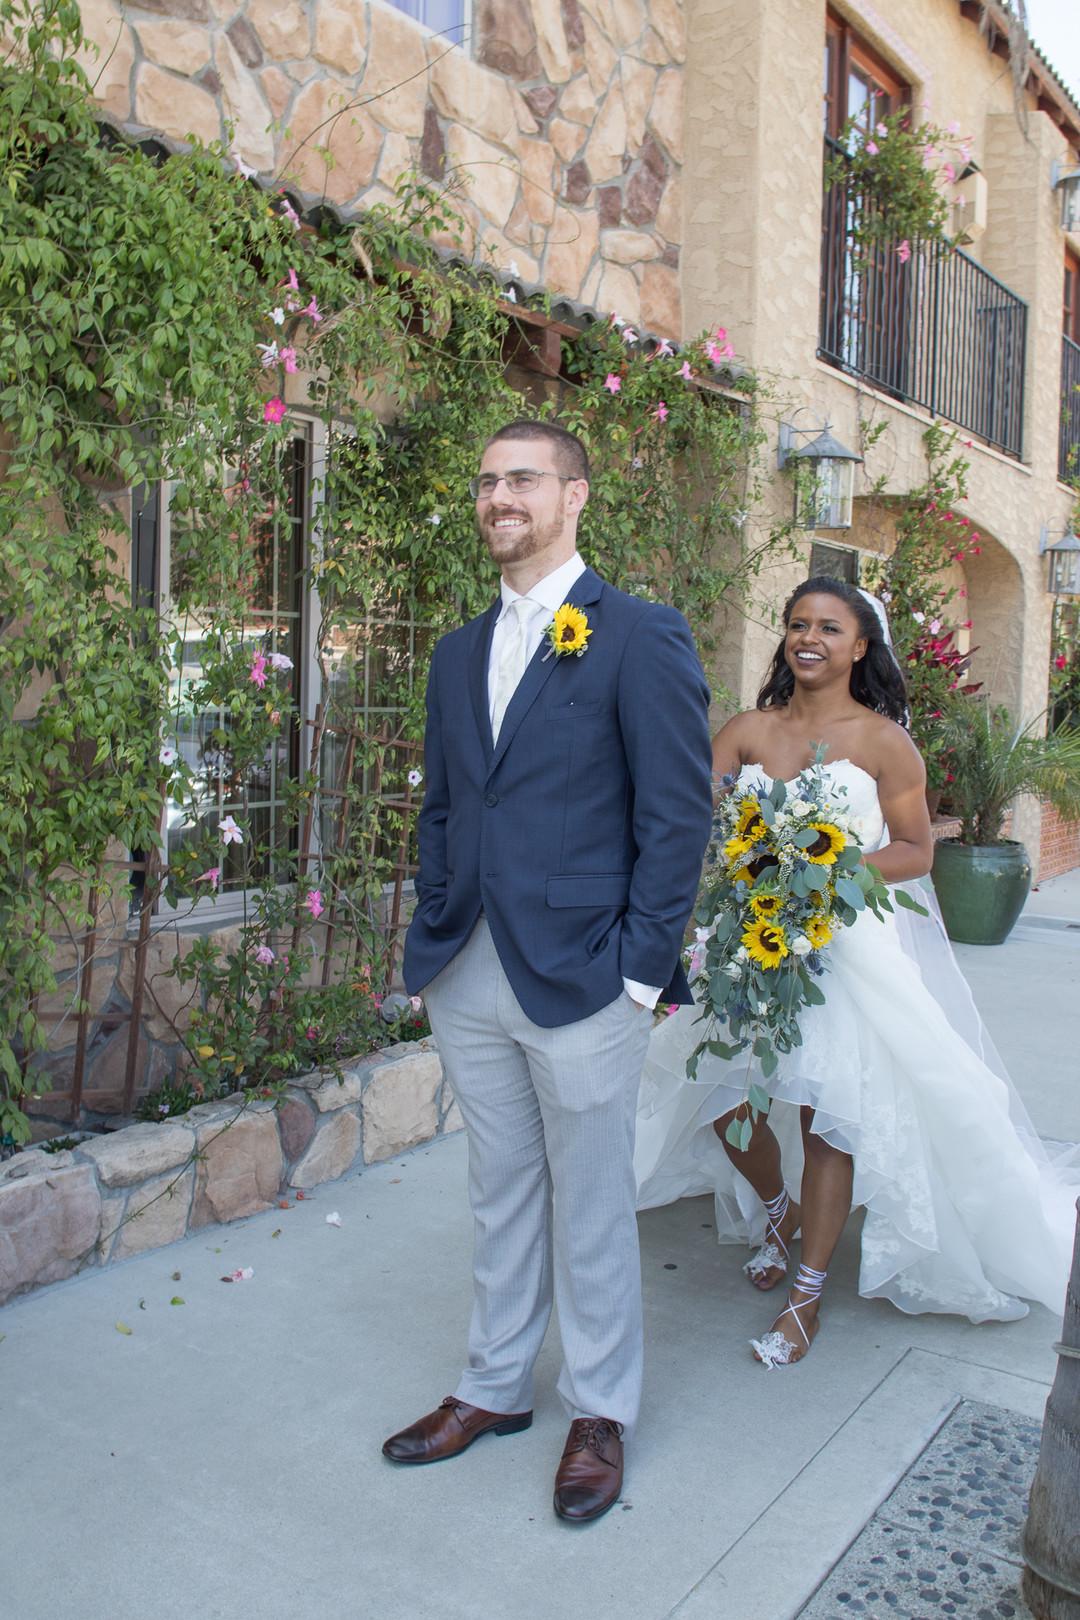 www.santabarbarawedding.com | Renoda Campbell | Weddings by Bobbie | Ventana Grill Events | First Look